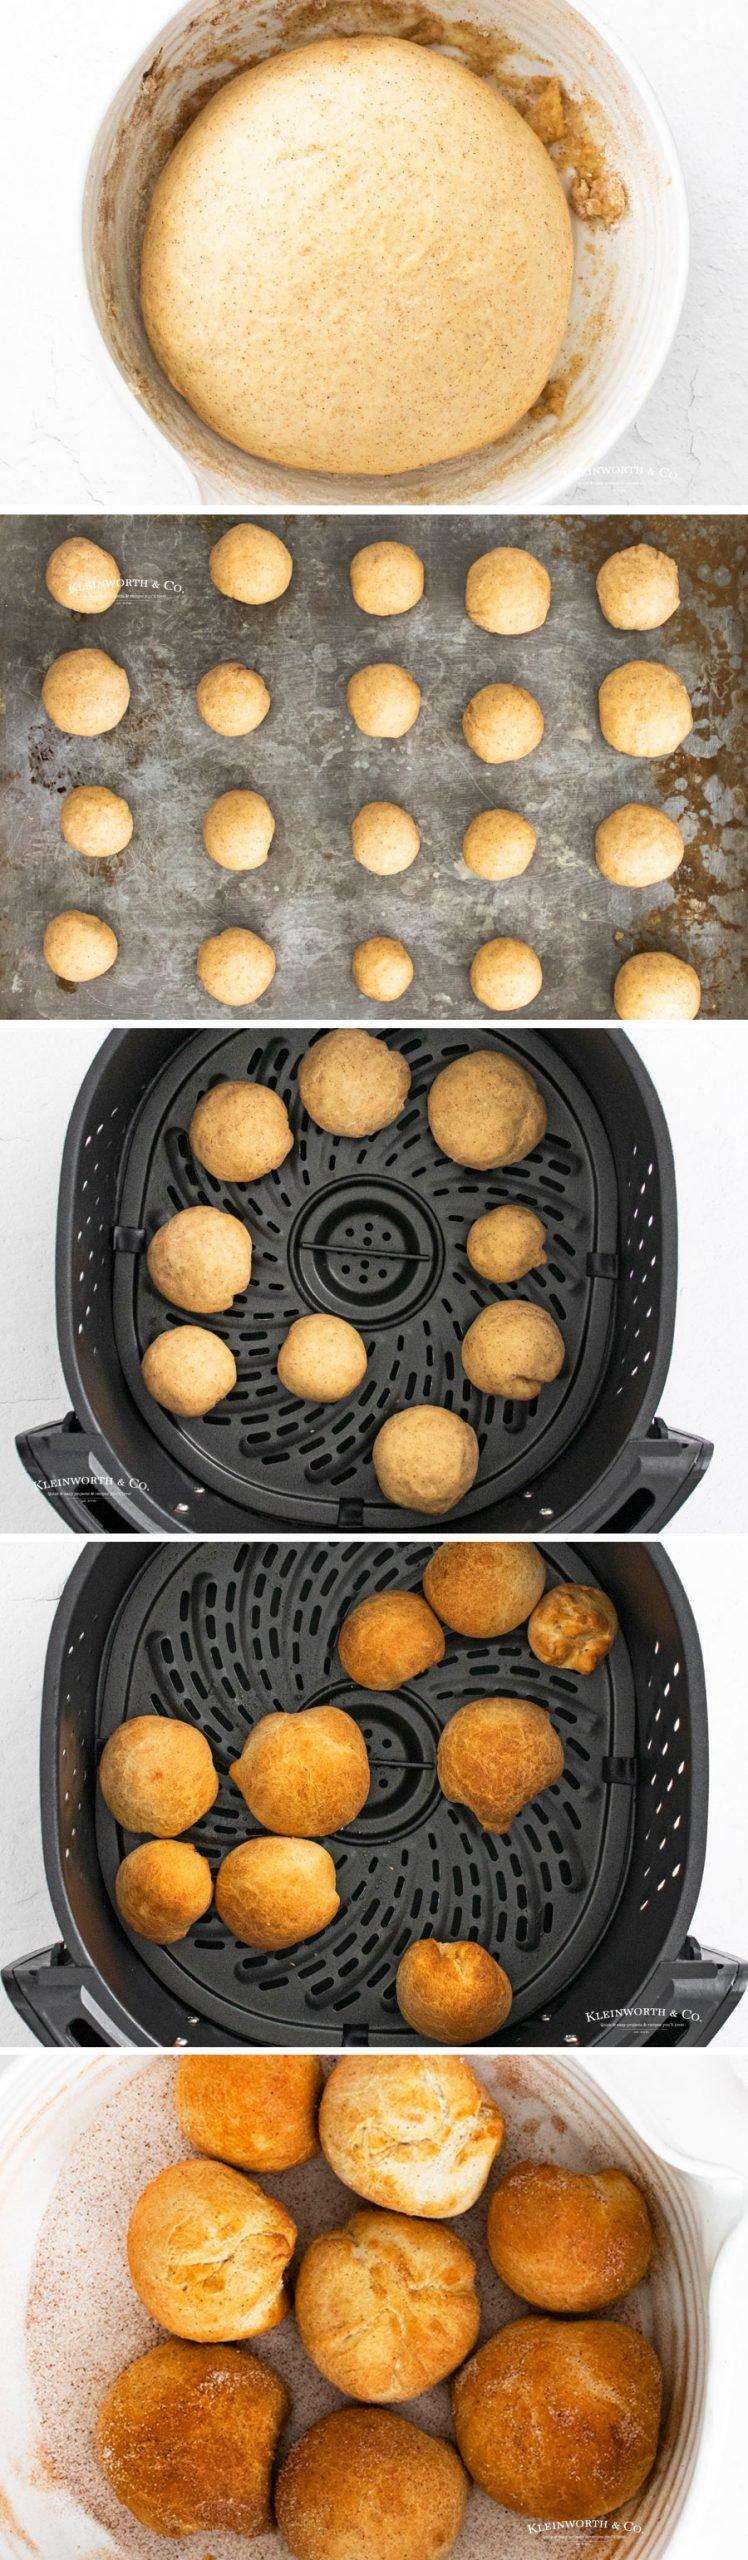 how to make Air Fryer Doughnut Holes